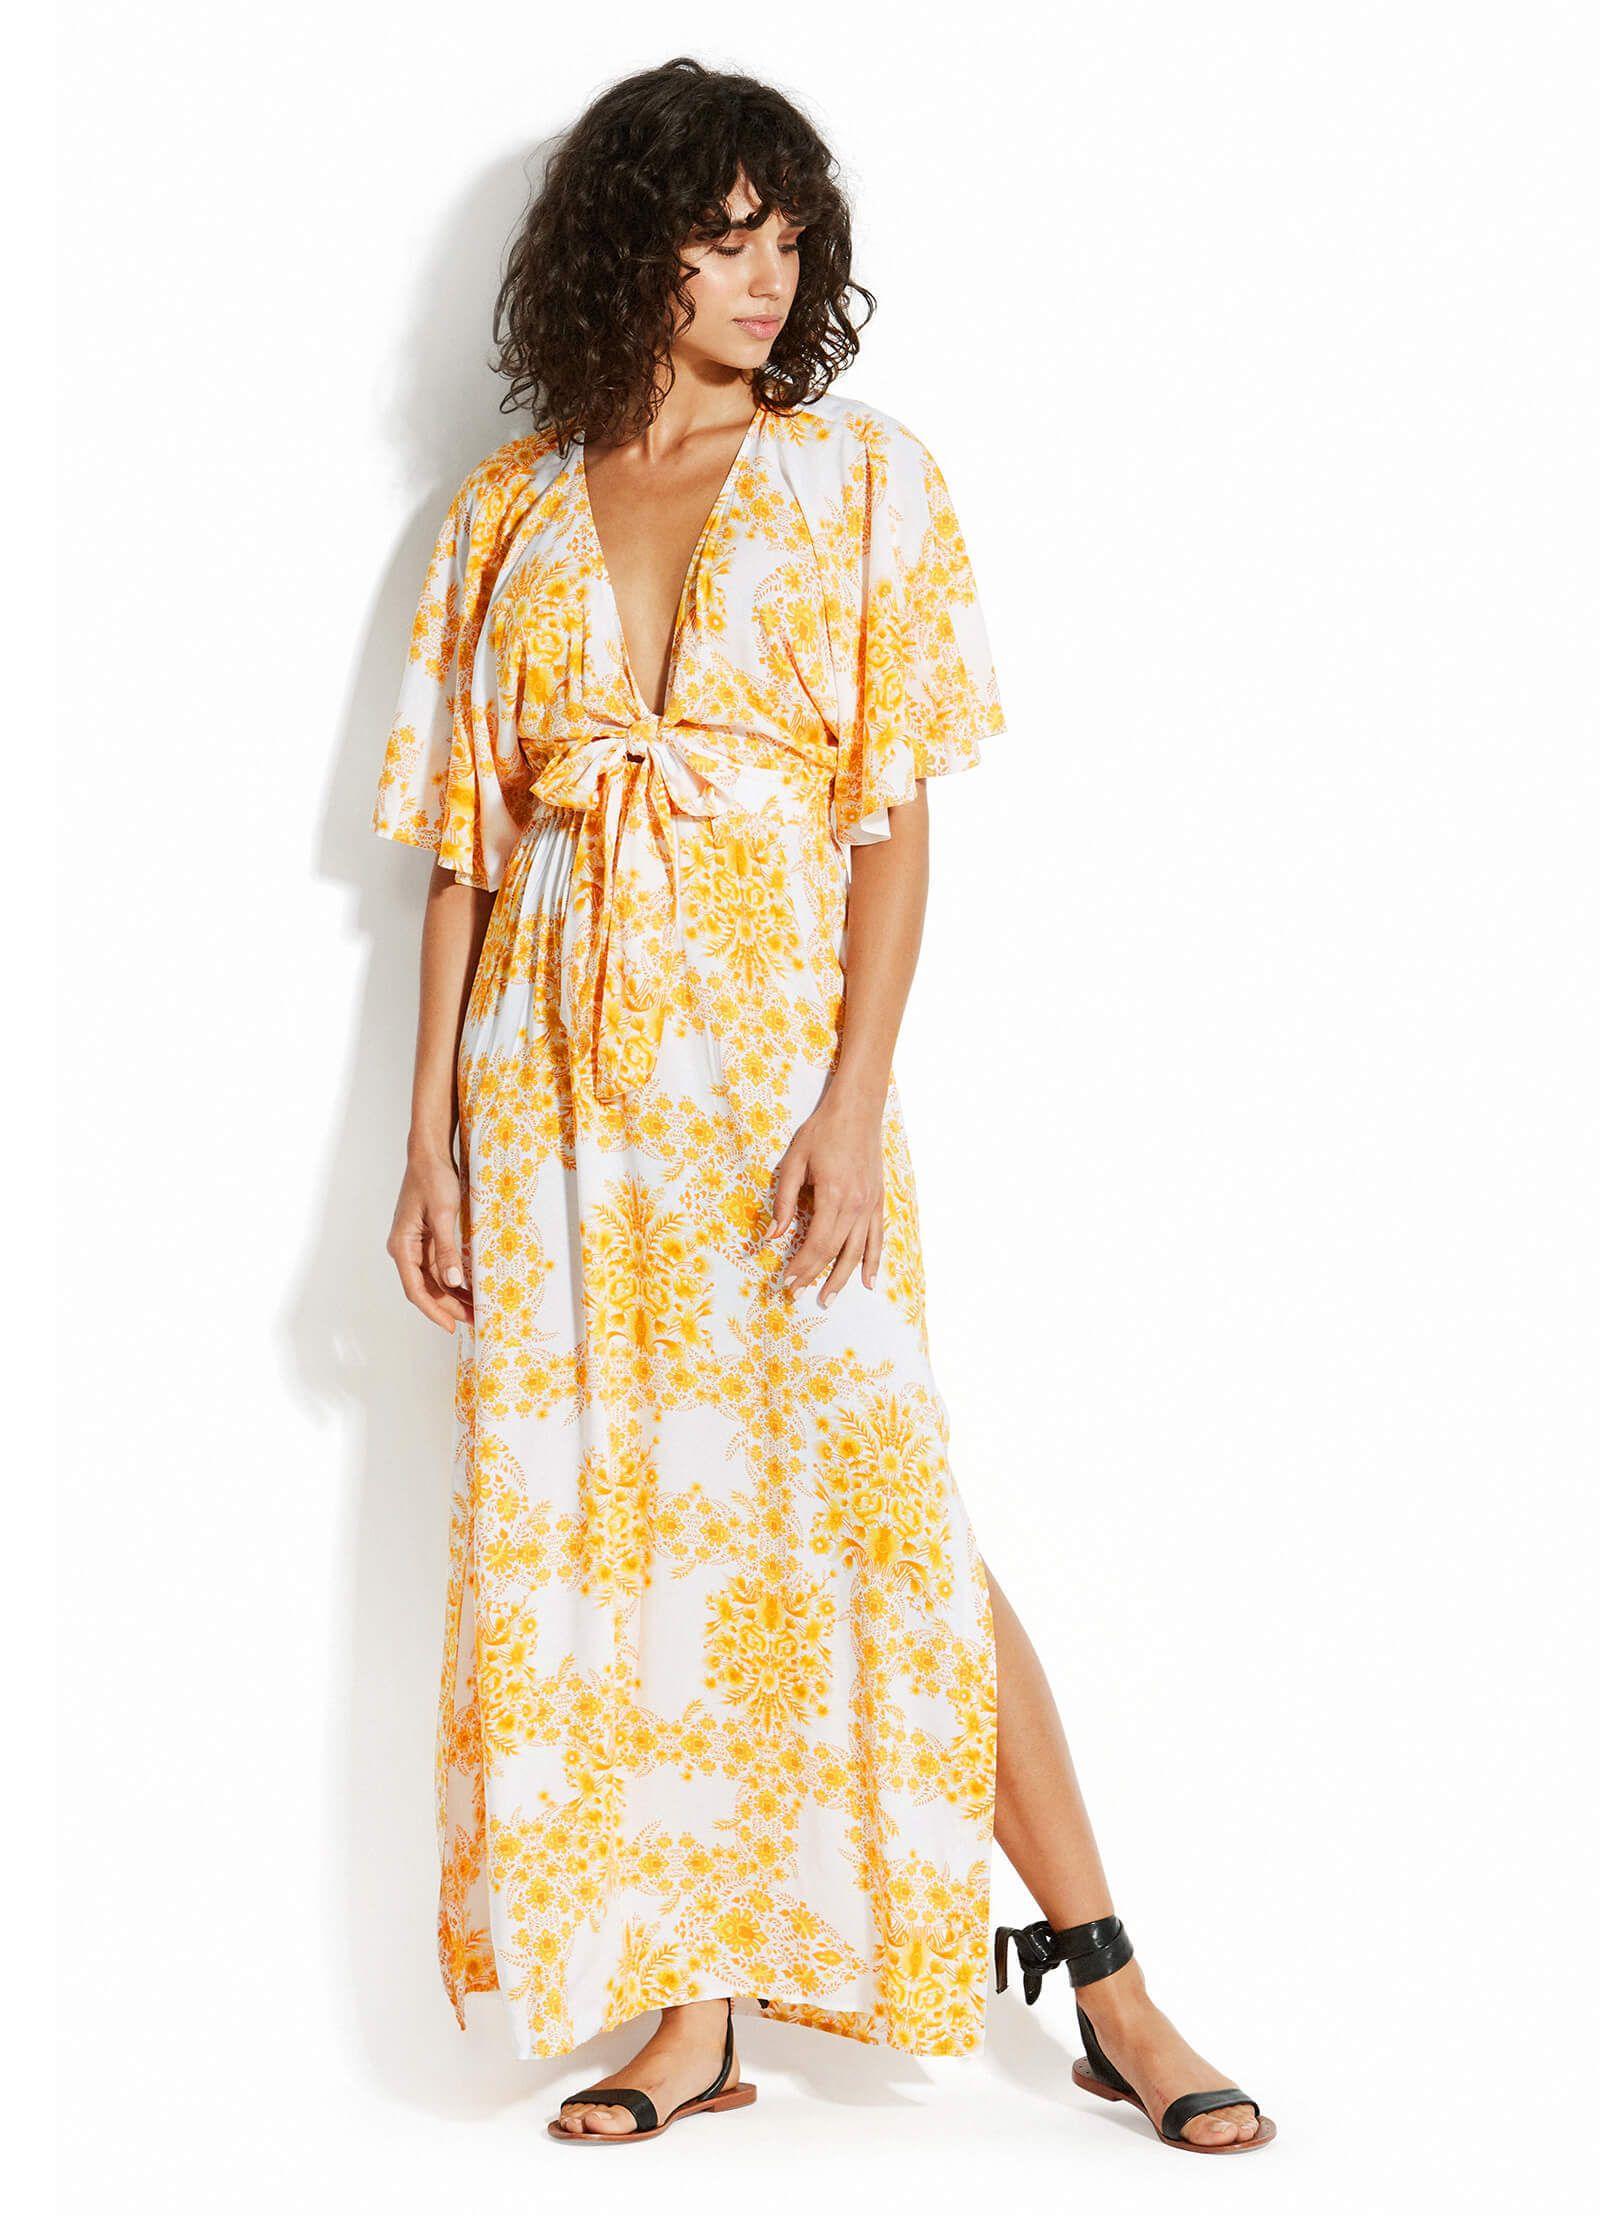 Sunflower Maxi Dress Seafolly Australia Maxi Dress Dresses Seafolly [ 2216 x 1600 Pixel ]